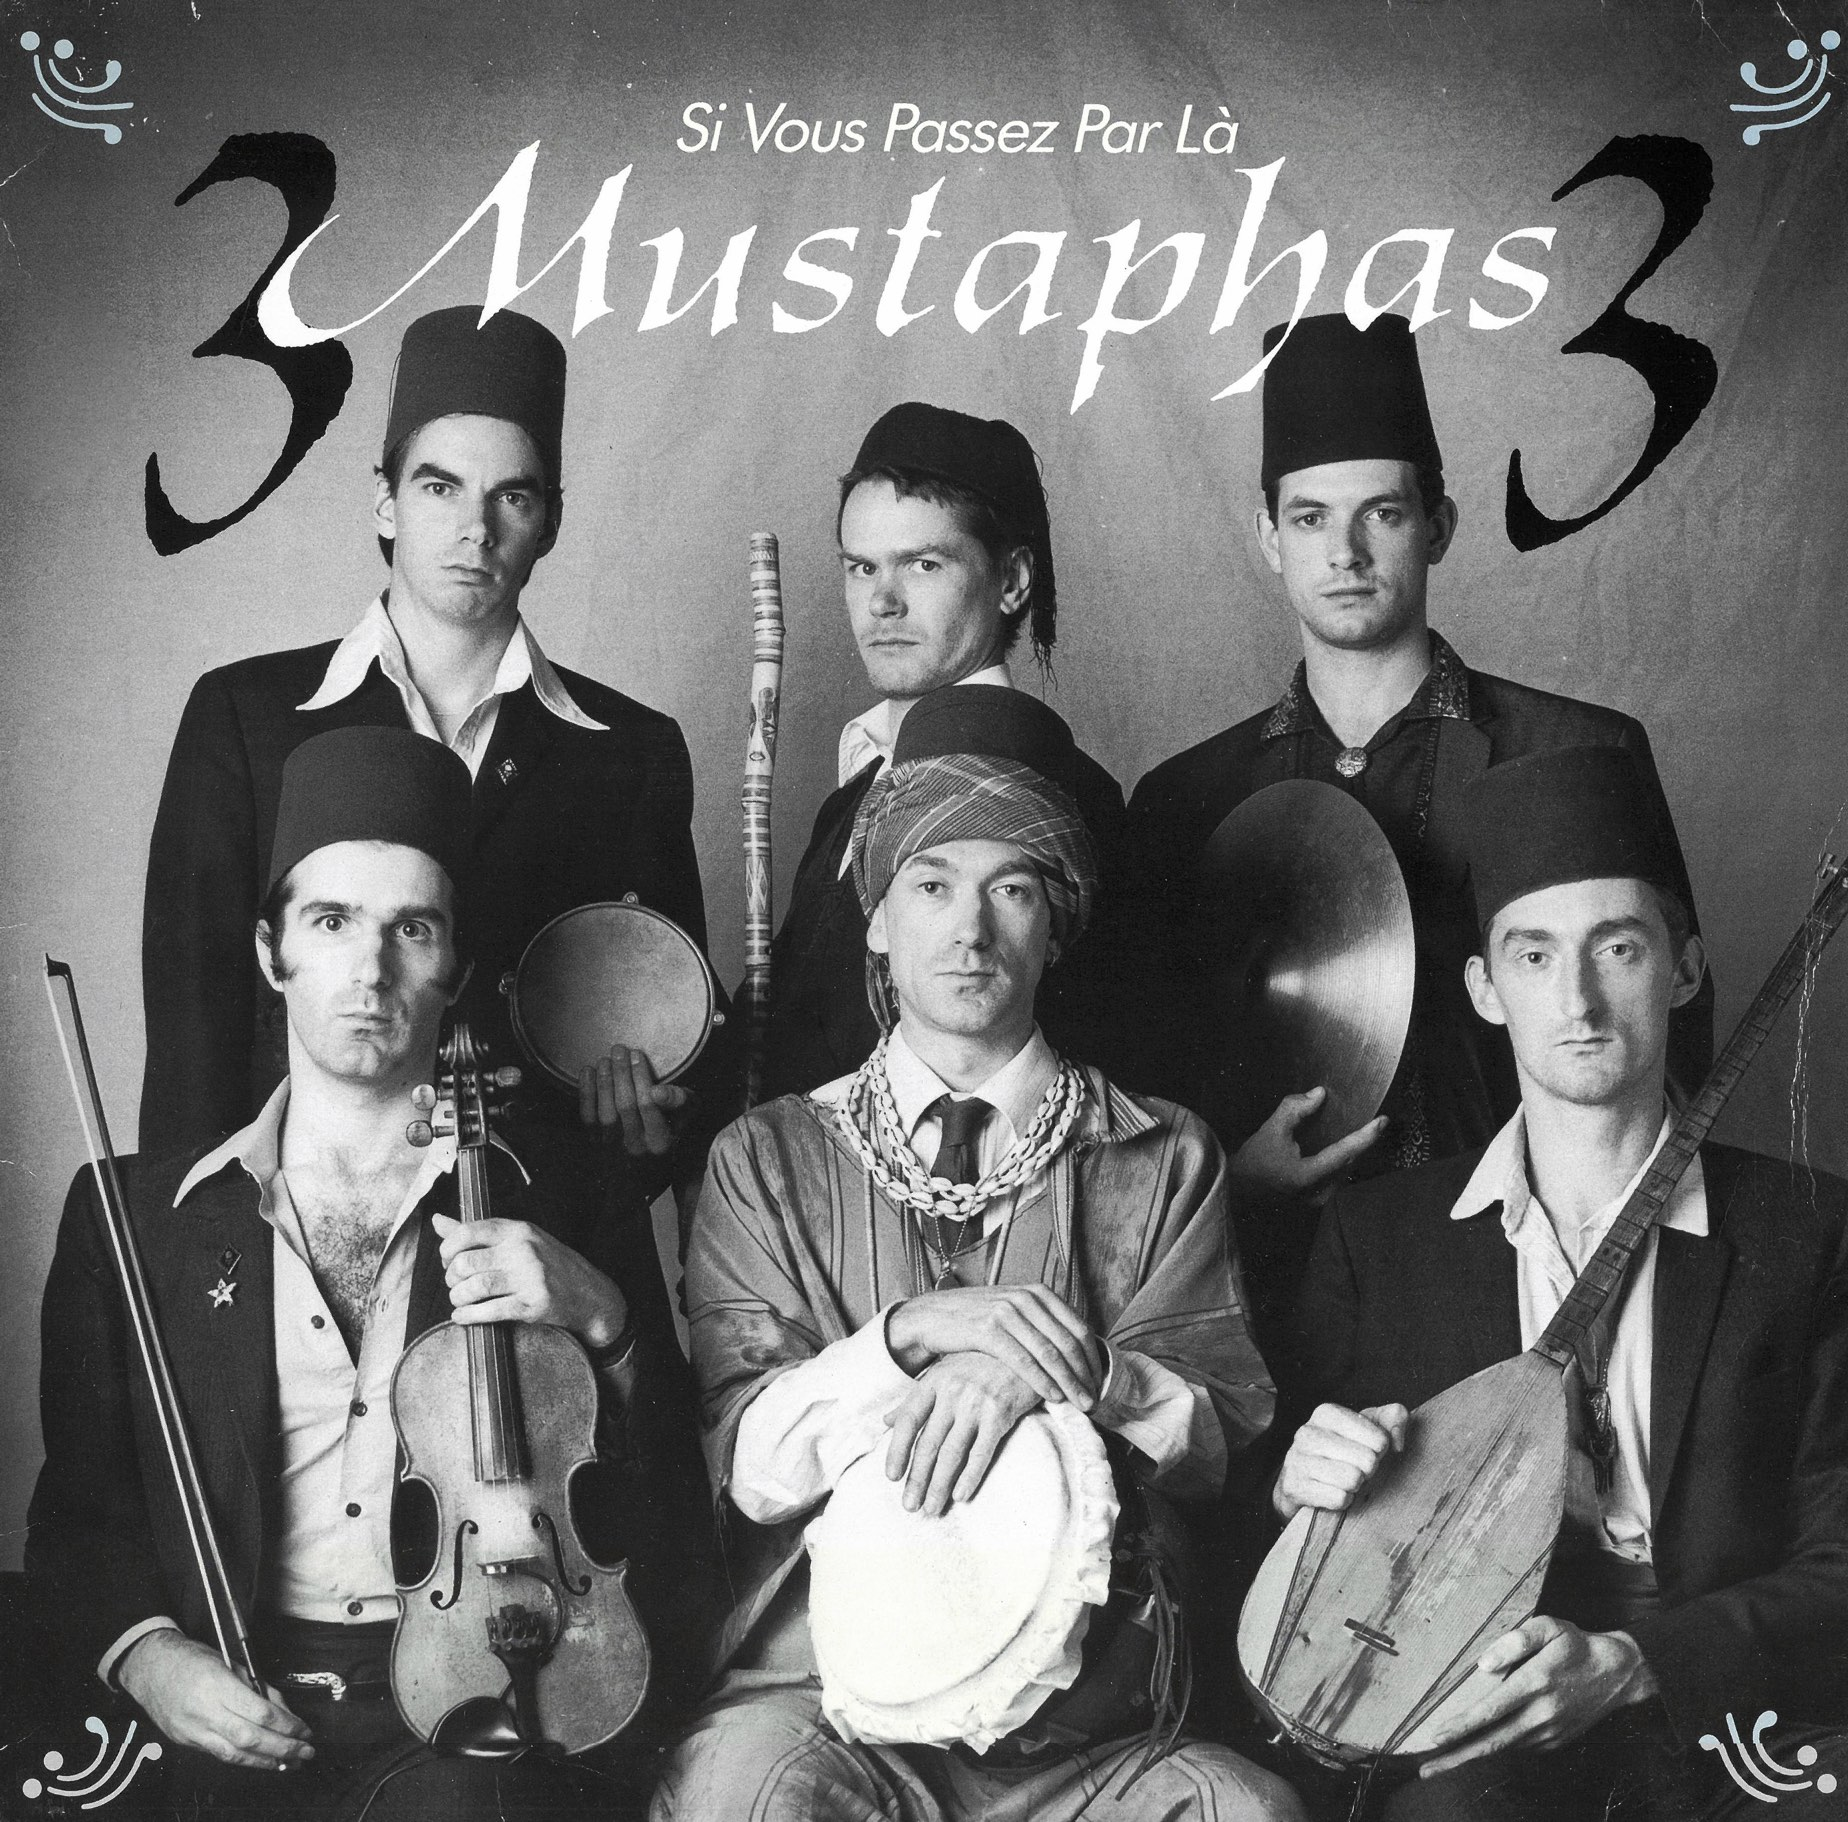 1986_3_Mustaphas_3